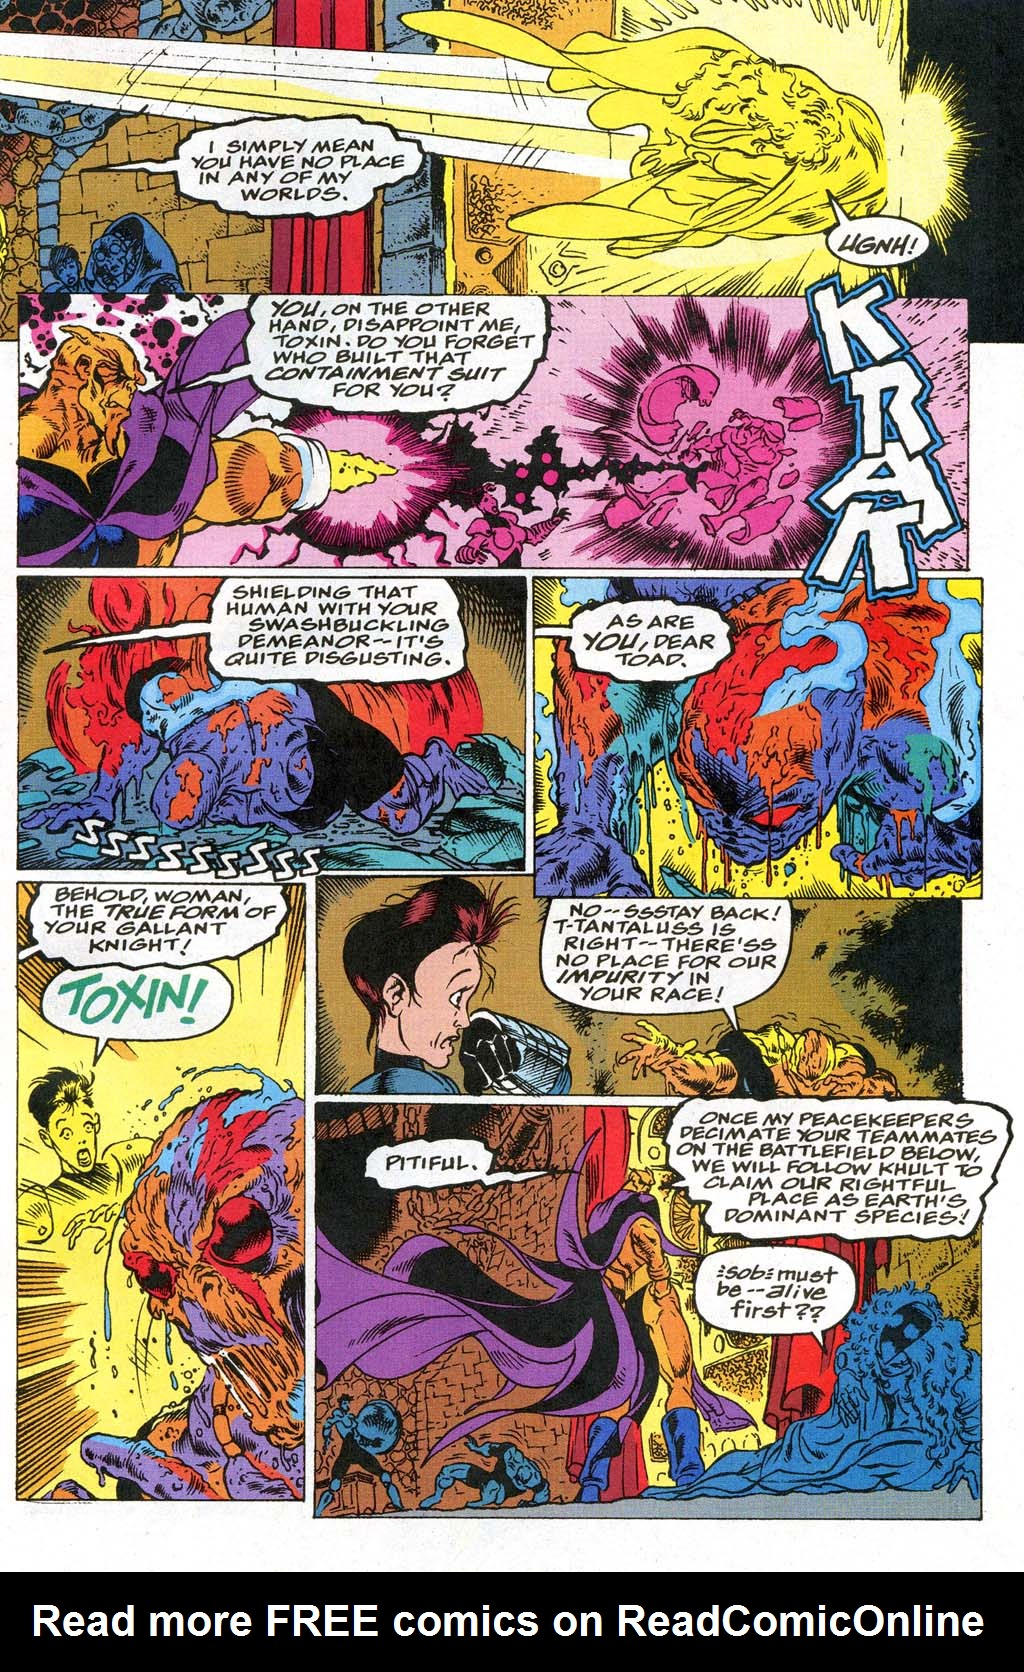 Read online Blackwulf comic -  Issue #9 - 10